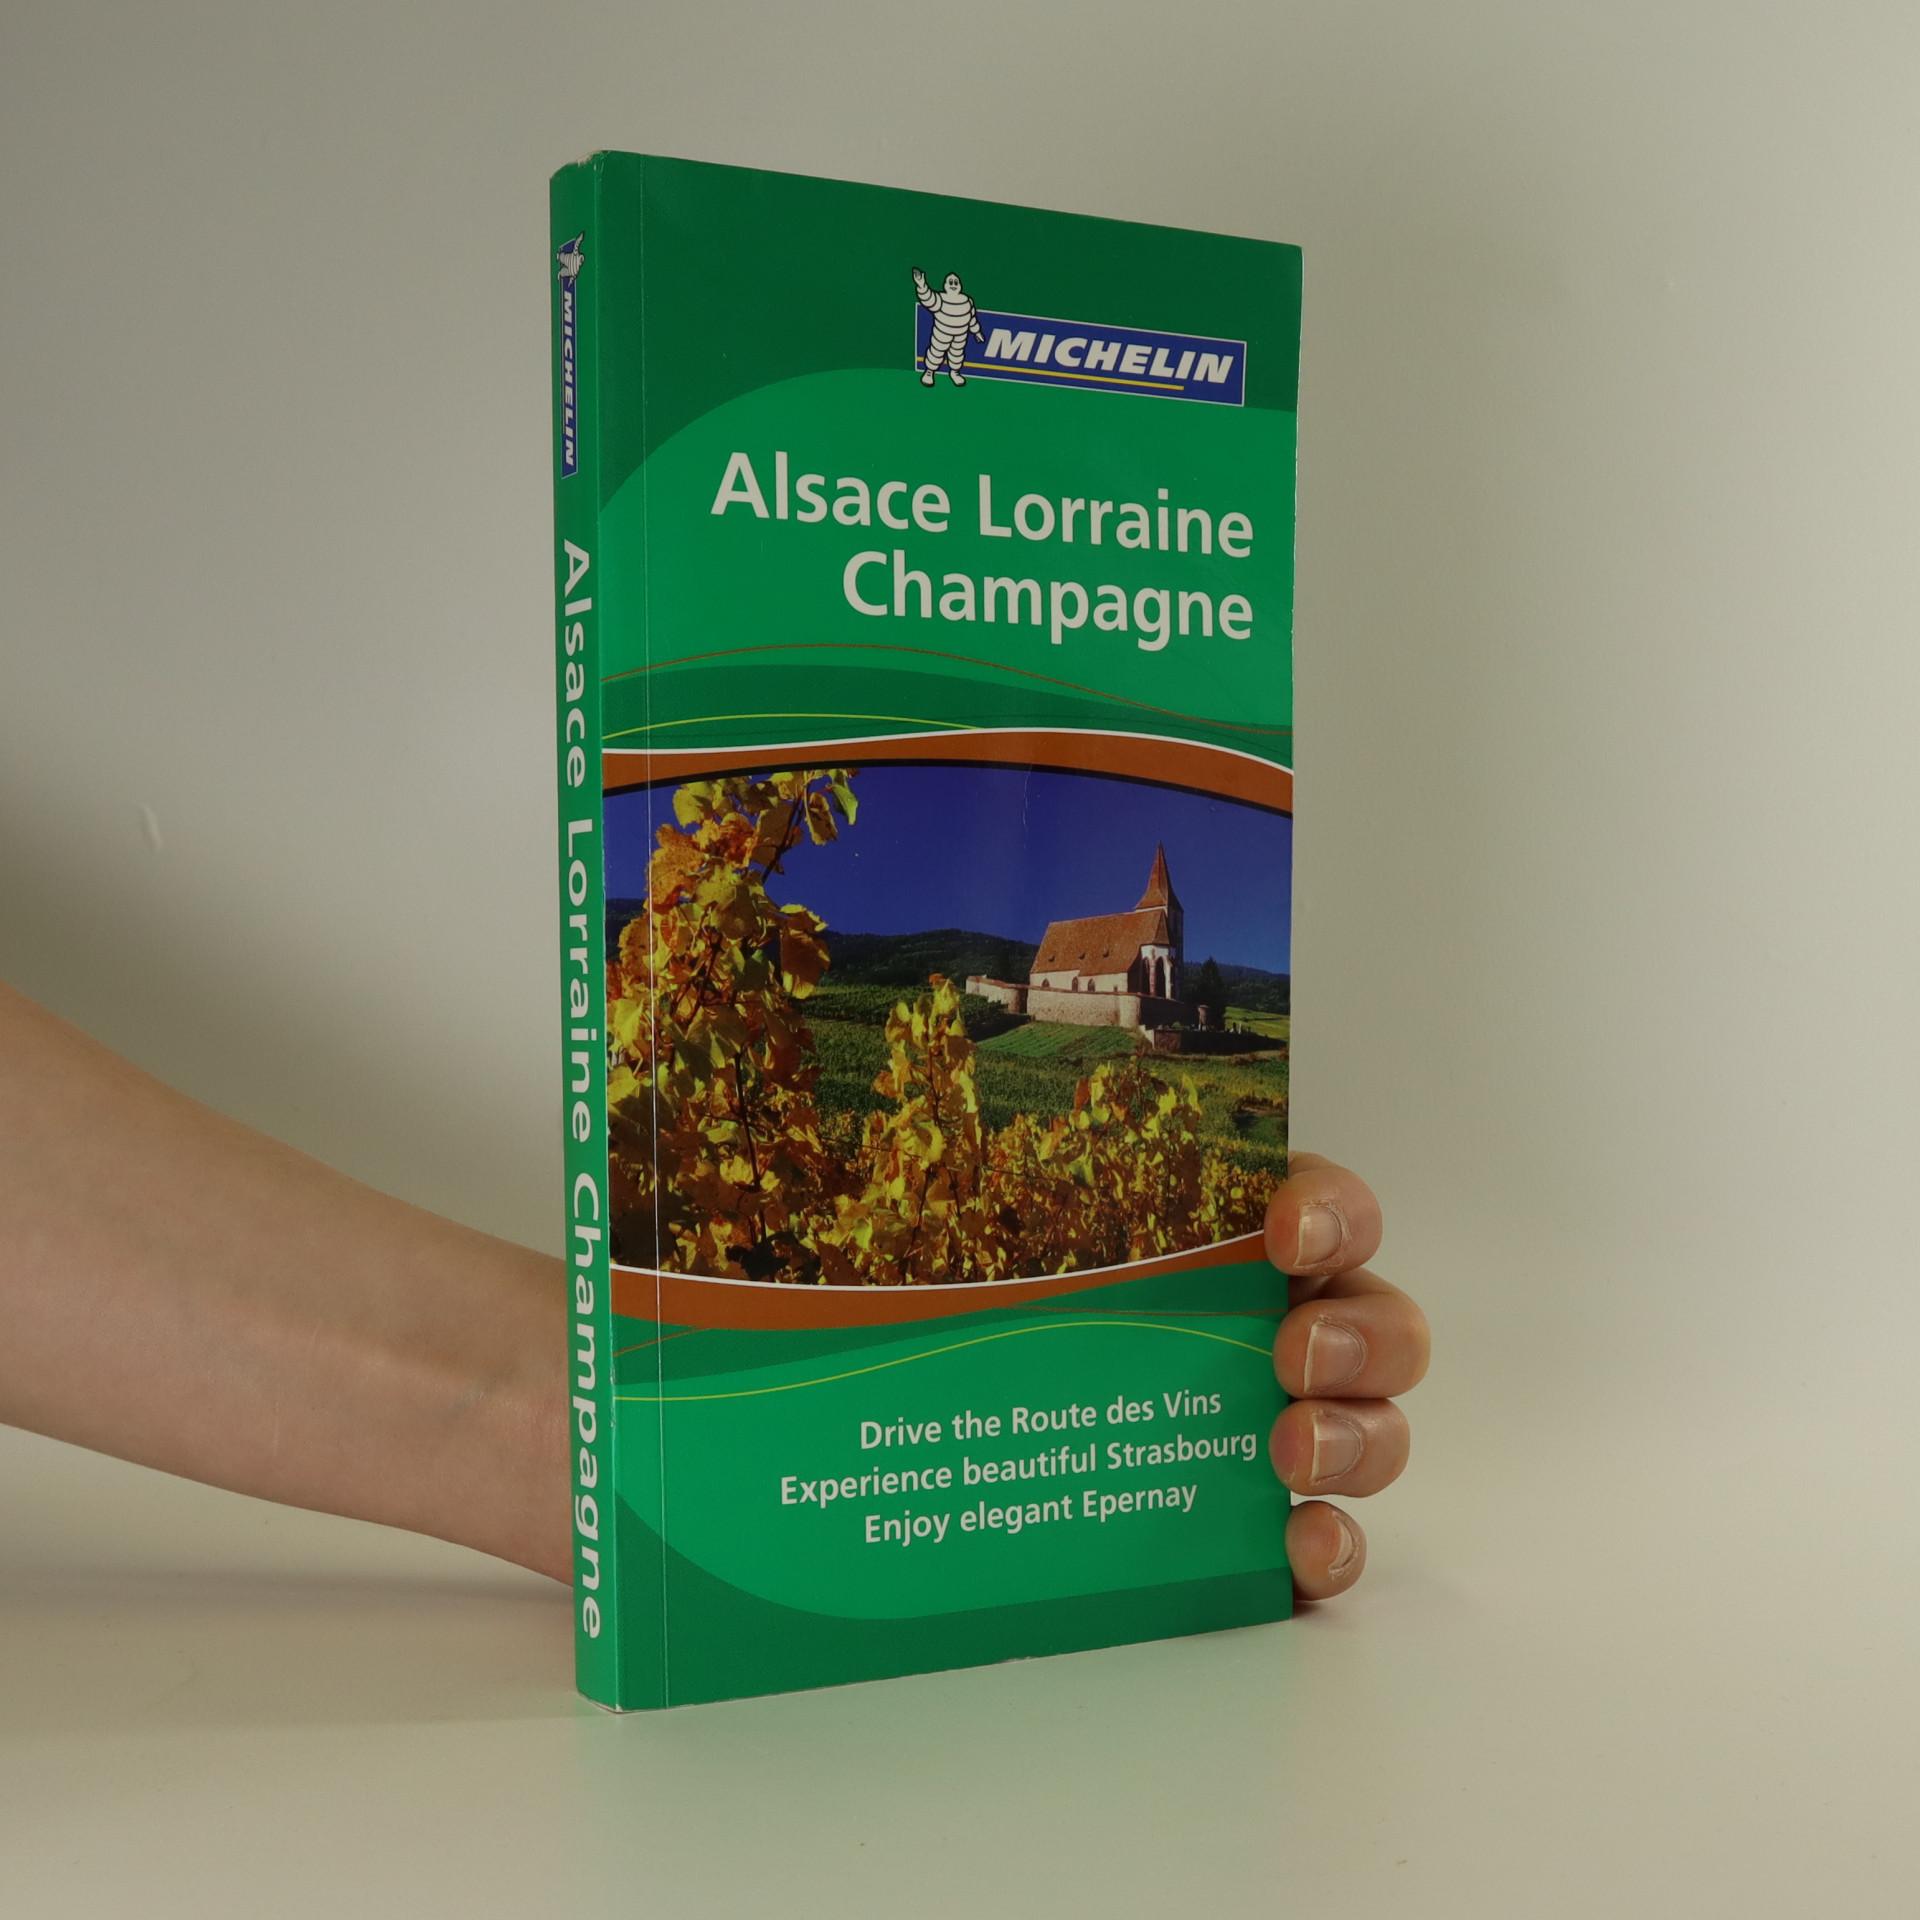 antikvární kniha Alsace Lorraine Champagne, 2007